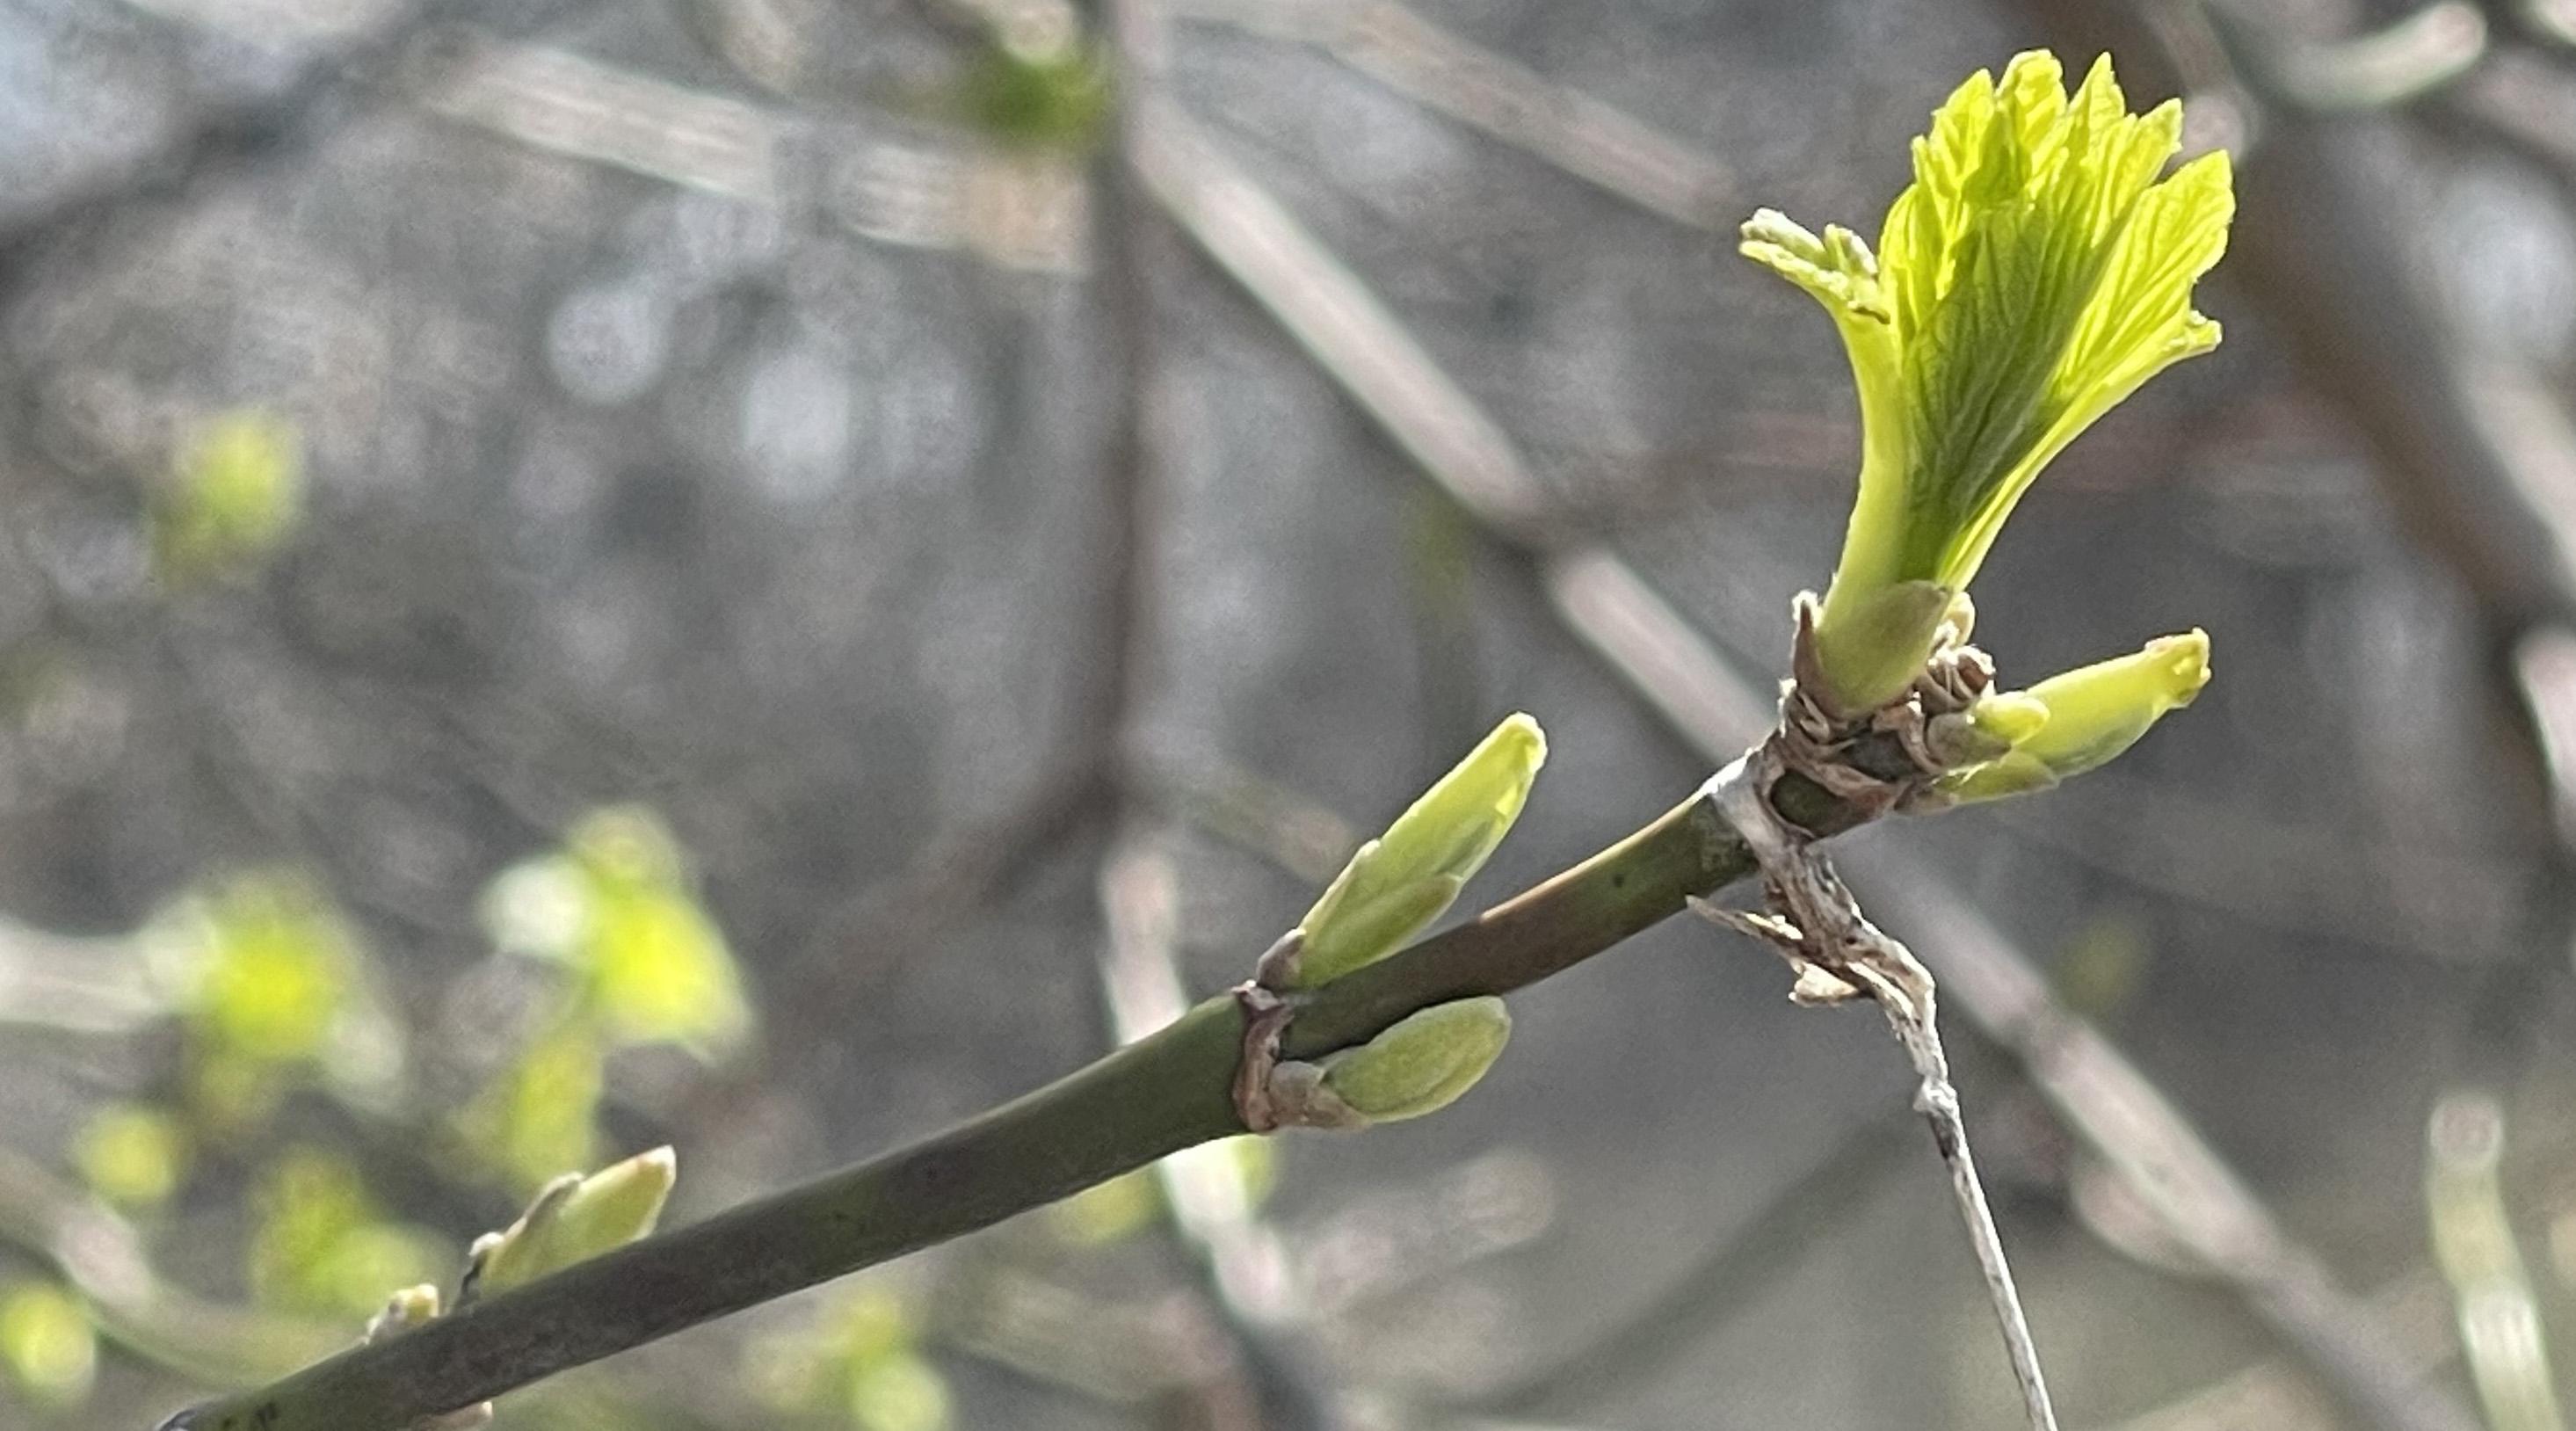 bud emerging